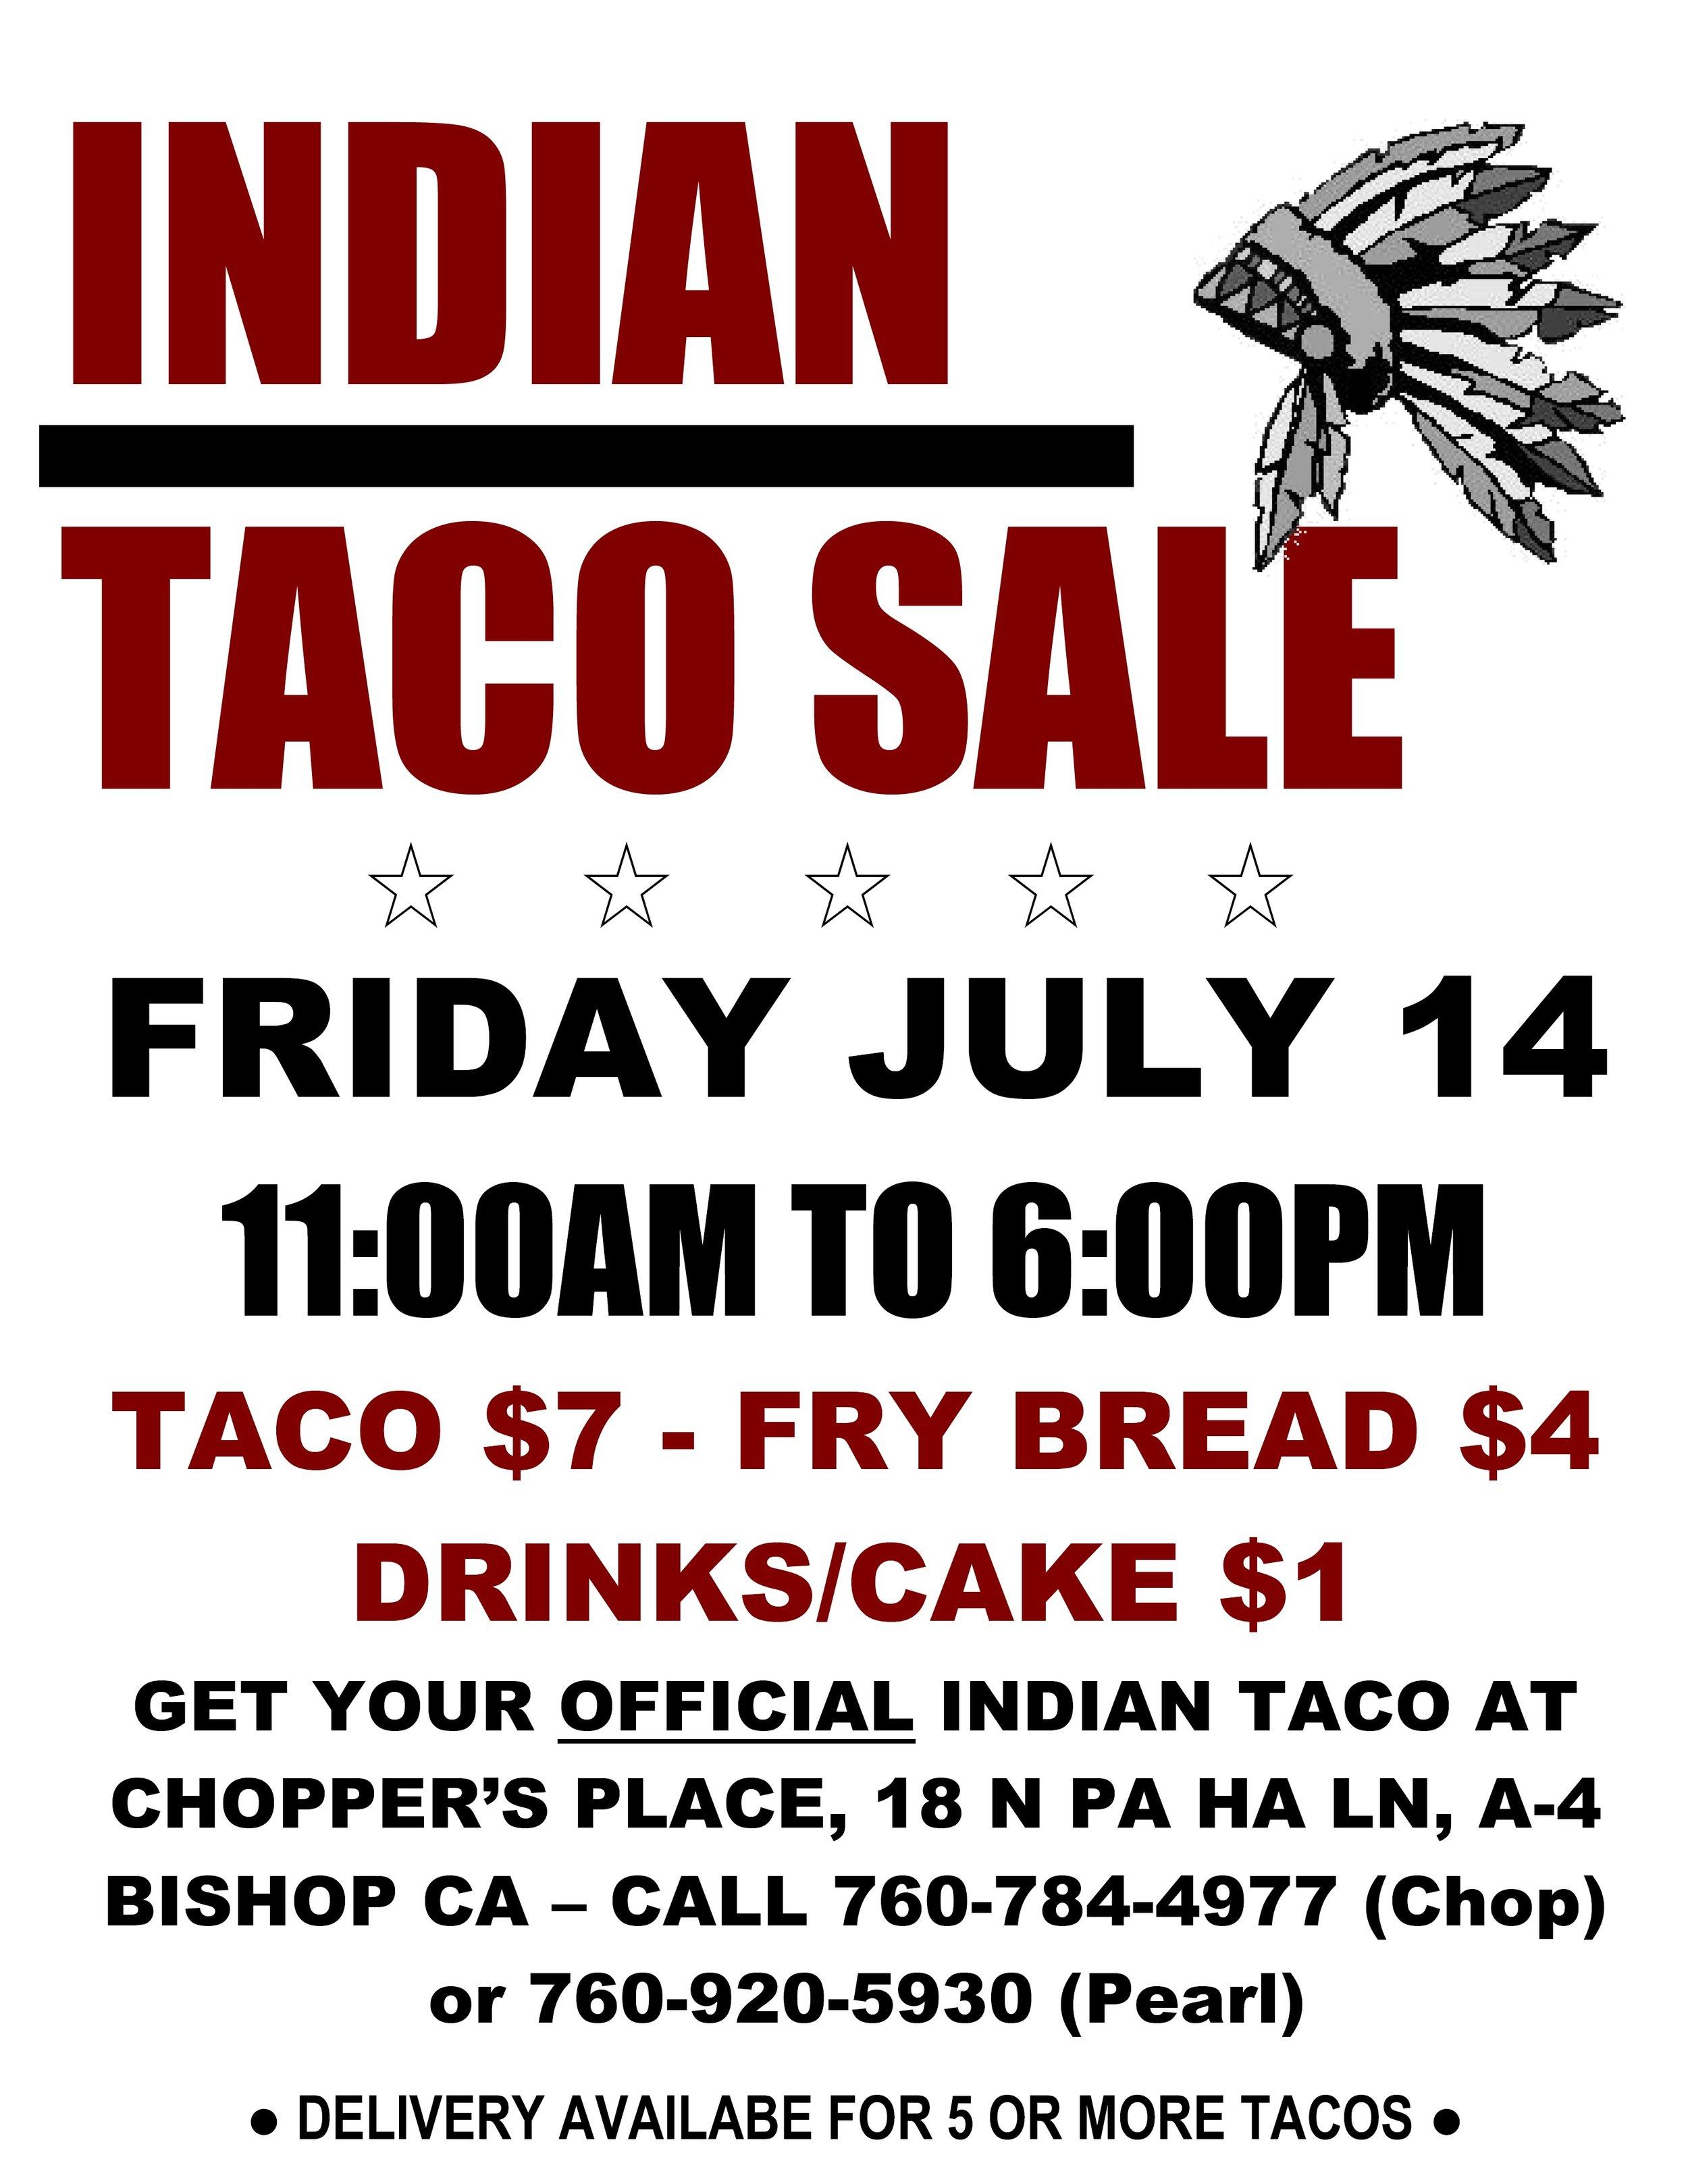 Indian Taco Sale Flyer July  2017.jpg